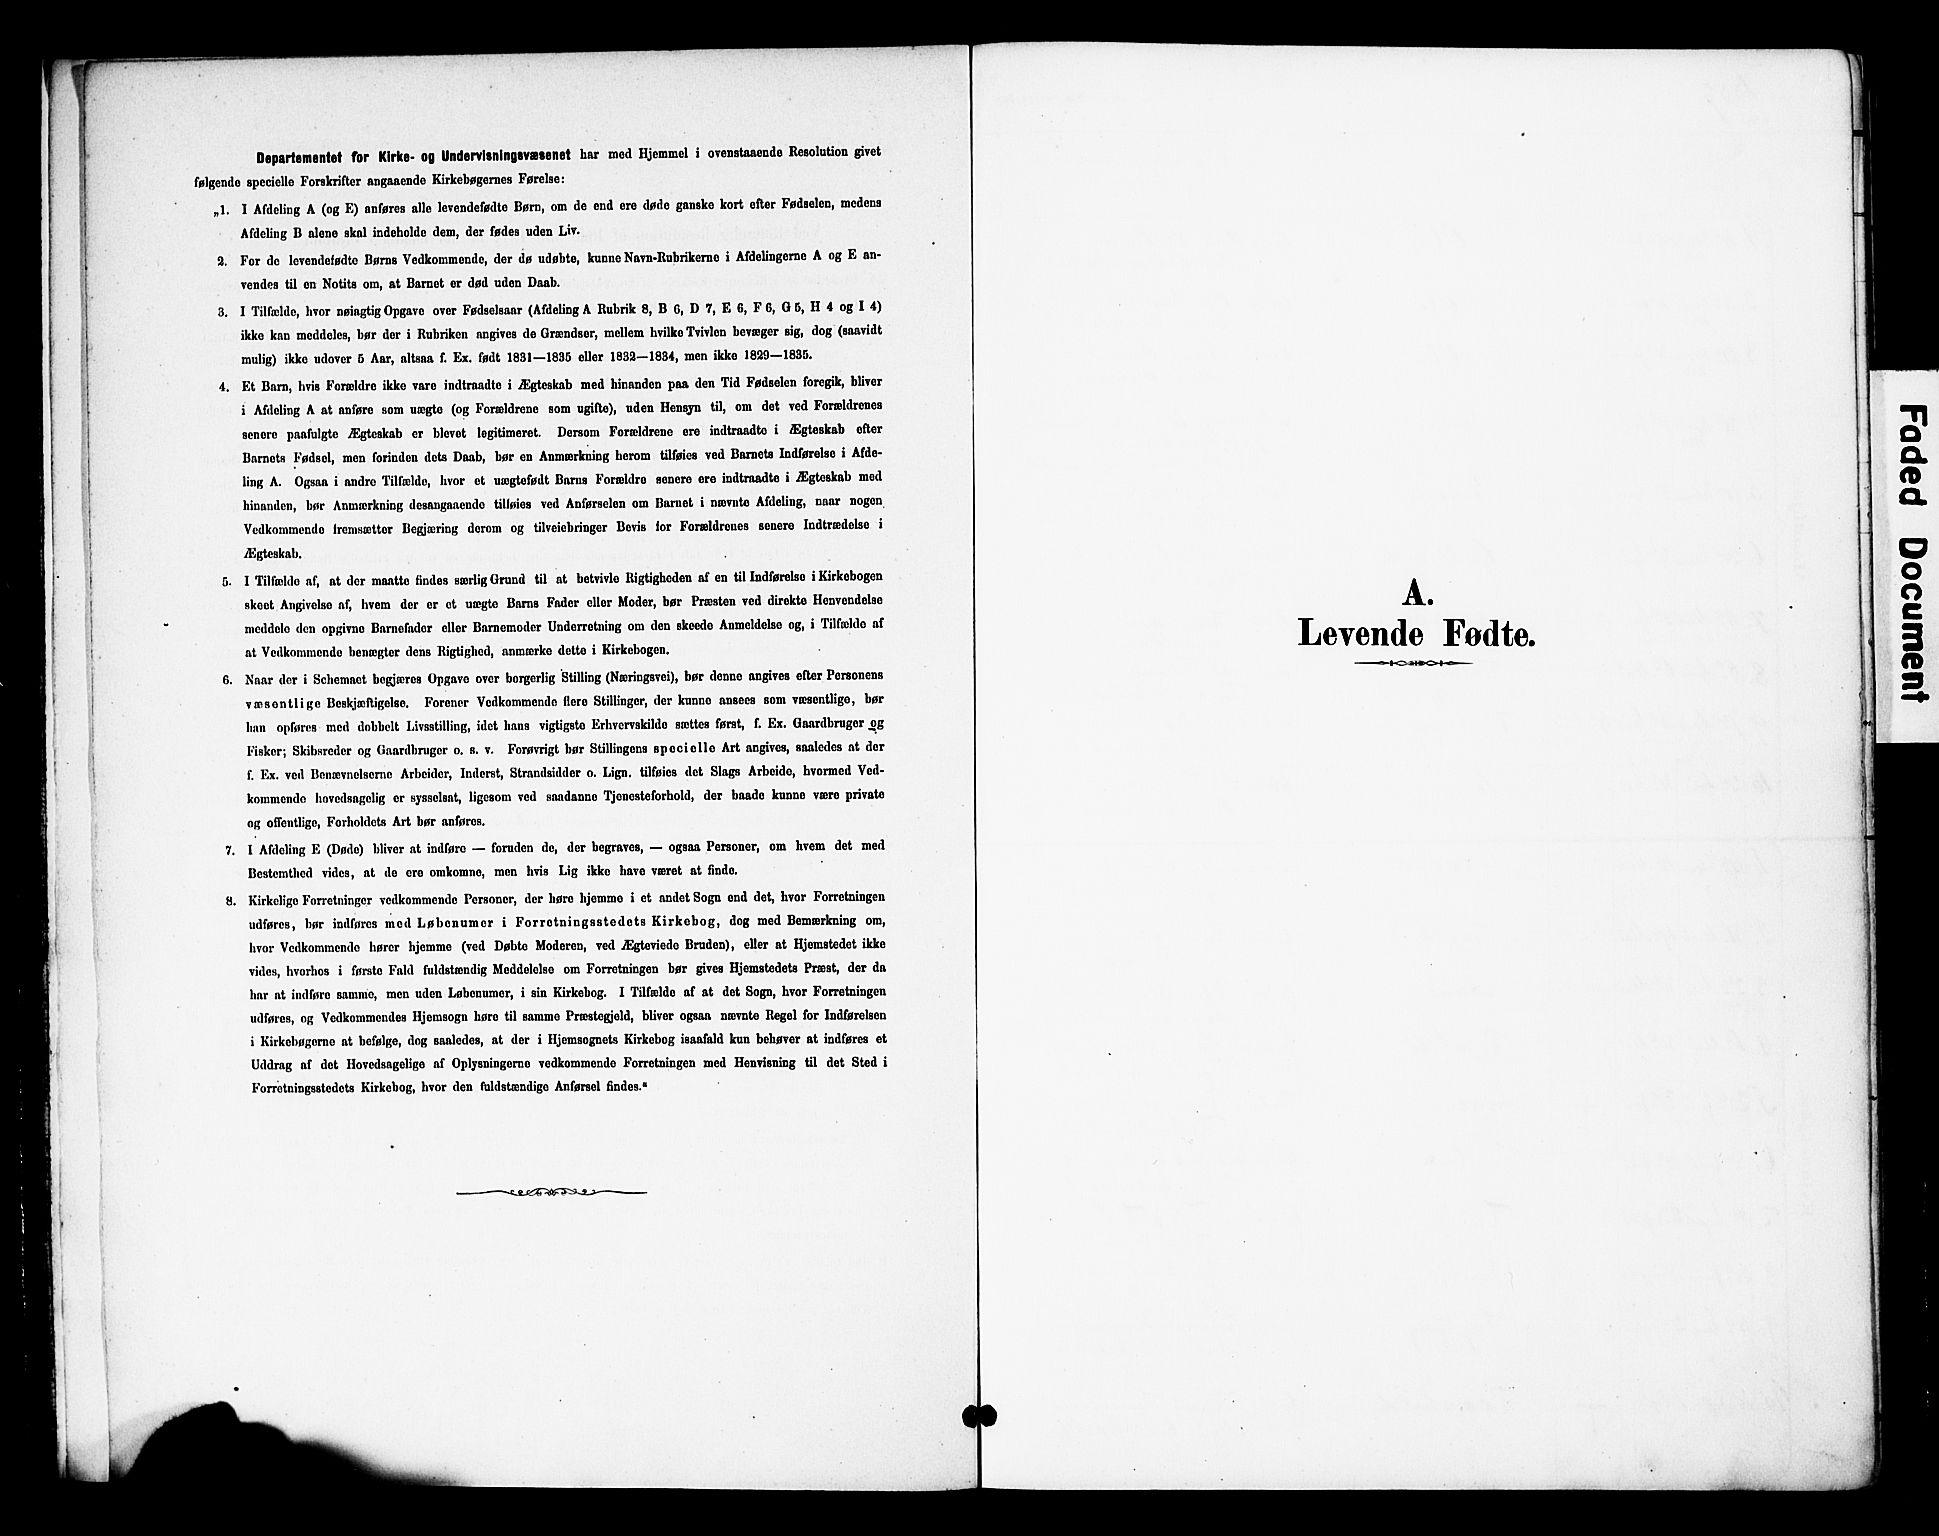 SAH, Øystre Slidre prestekontor, Ministerialbok nr. 3, 1887-1910